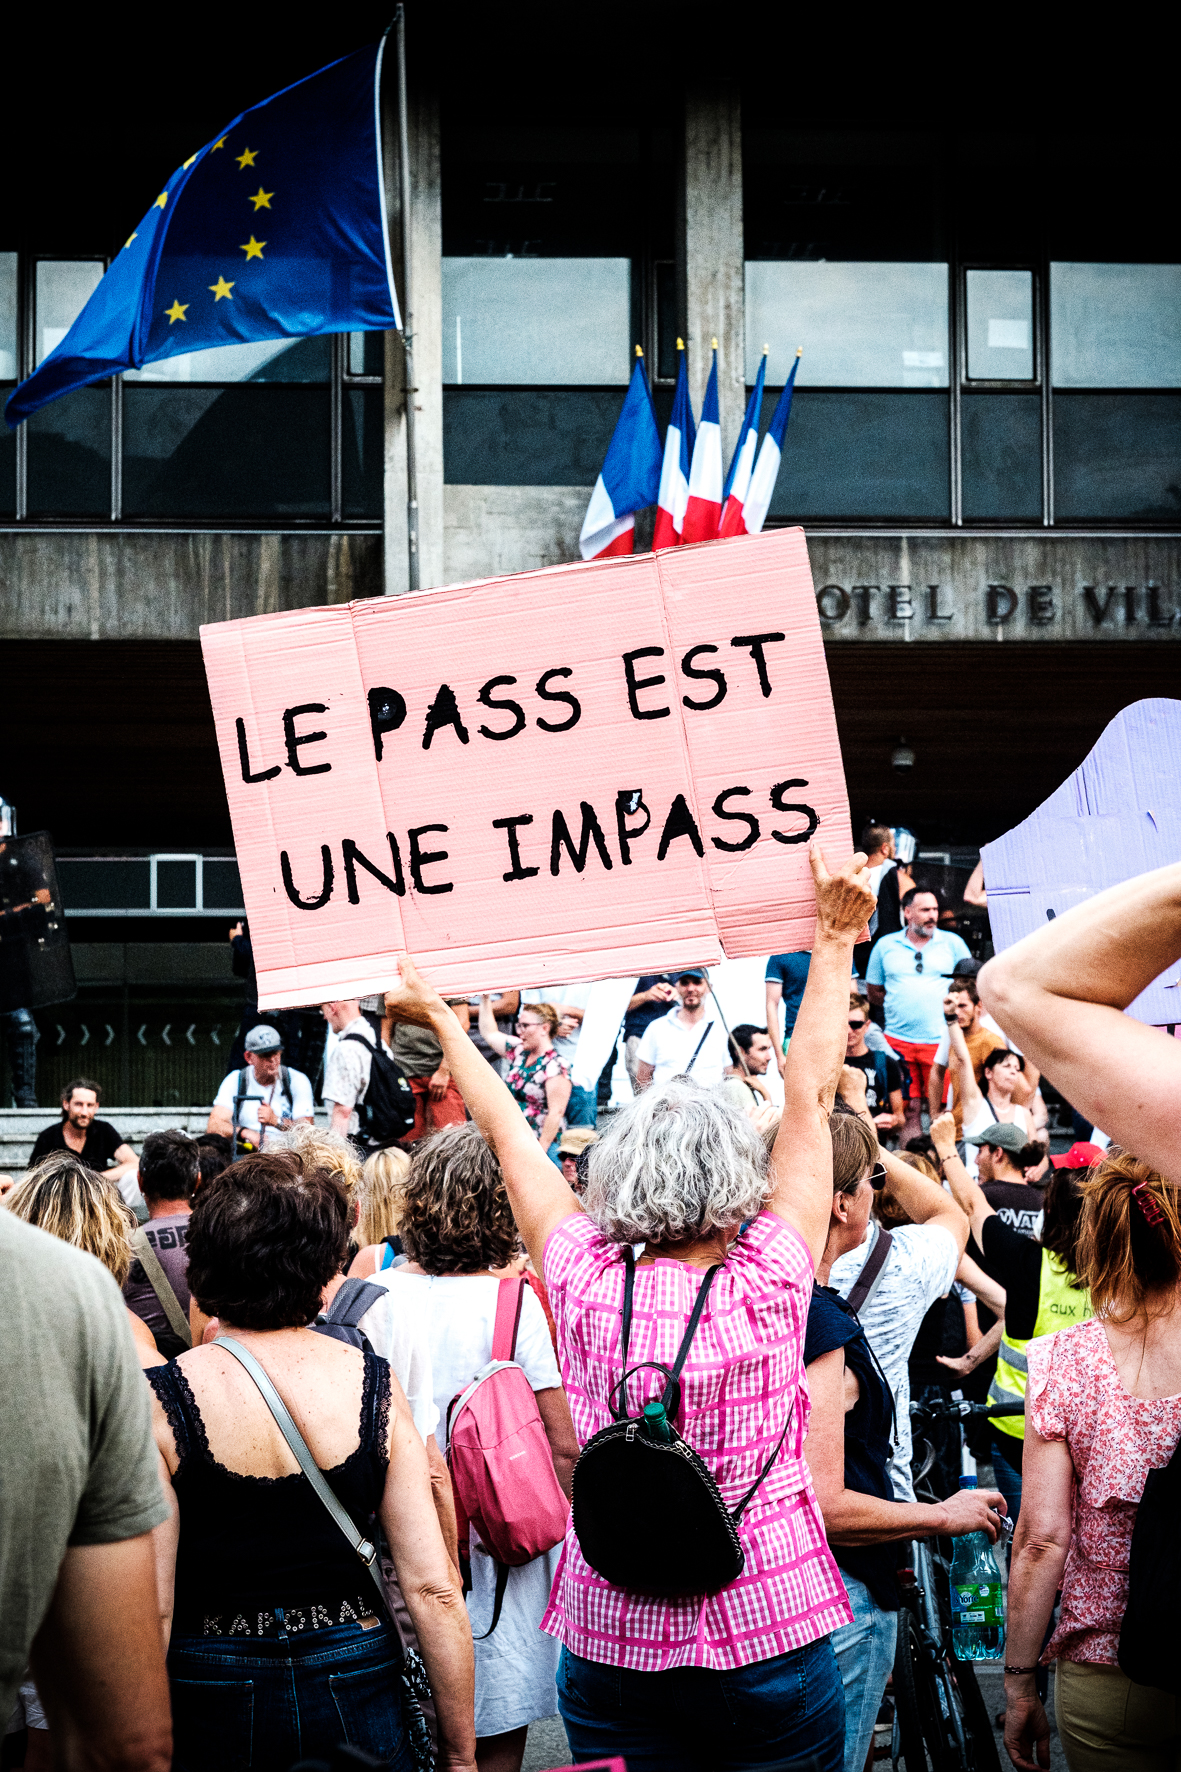 Samedi 24 juillet 2021, Grenoble, manifestation anti pass sanitaire